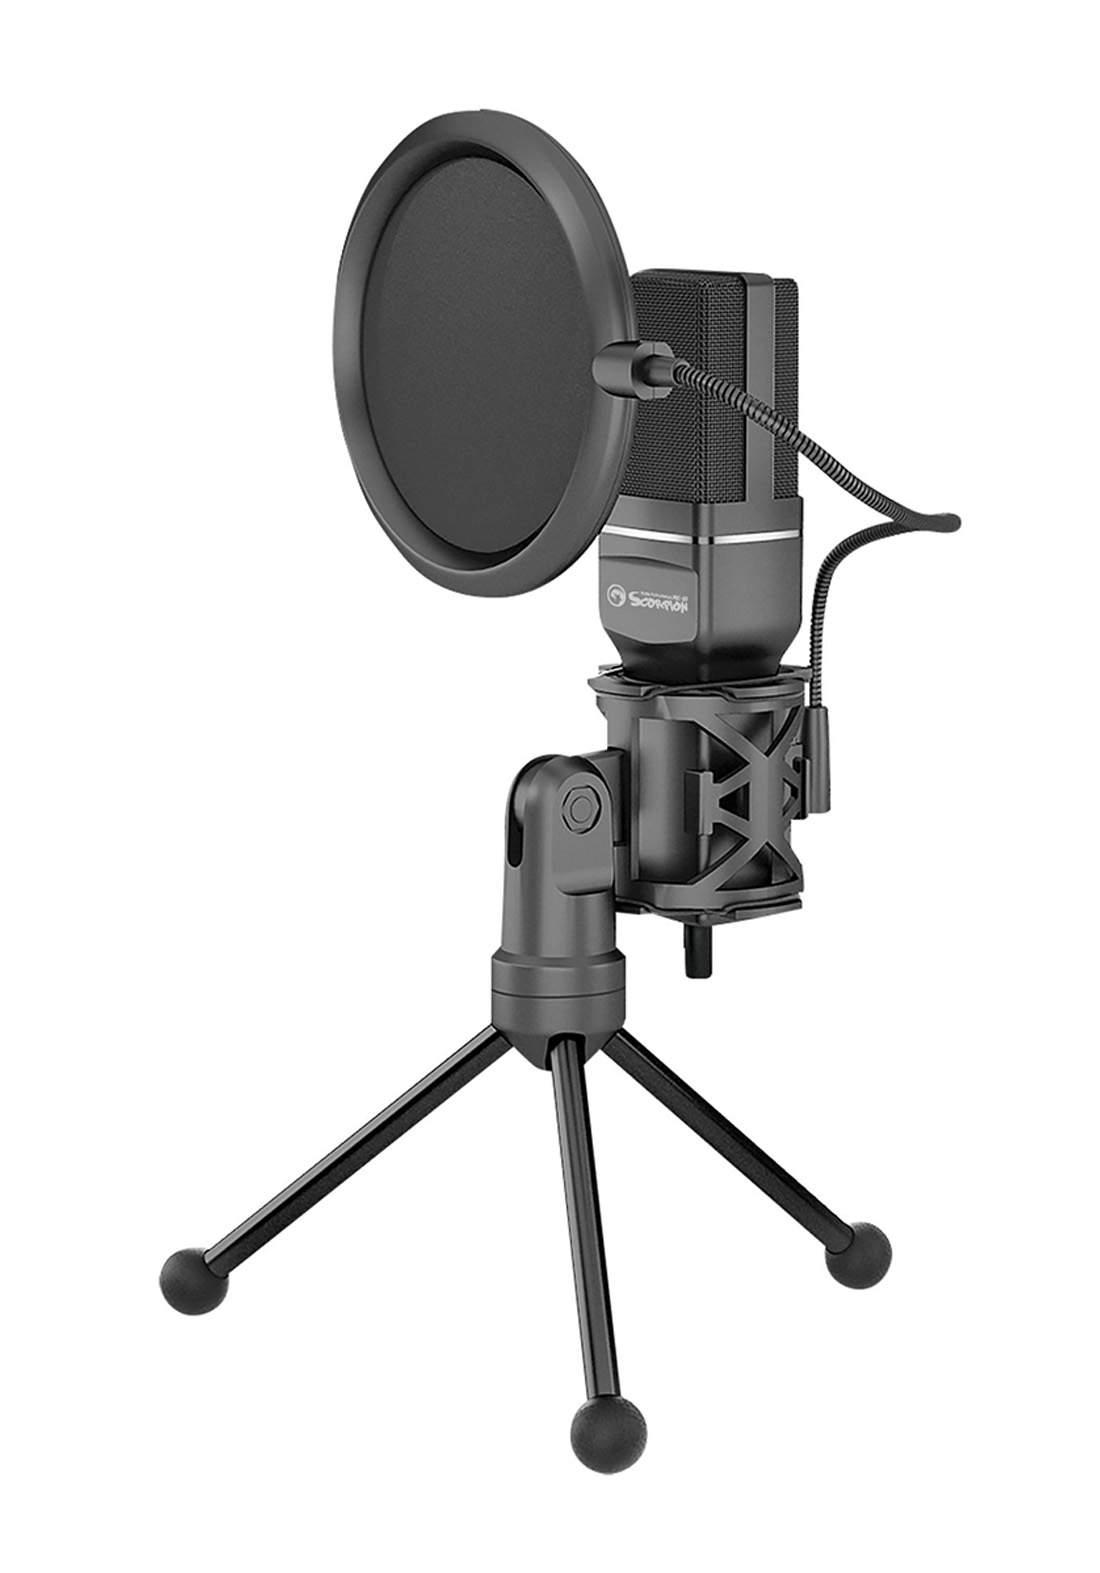 Marvo Scorpion MIC-03 USB Desktop Microphone - Black مايكروفون